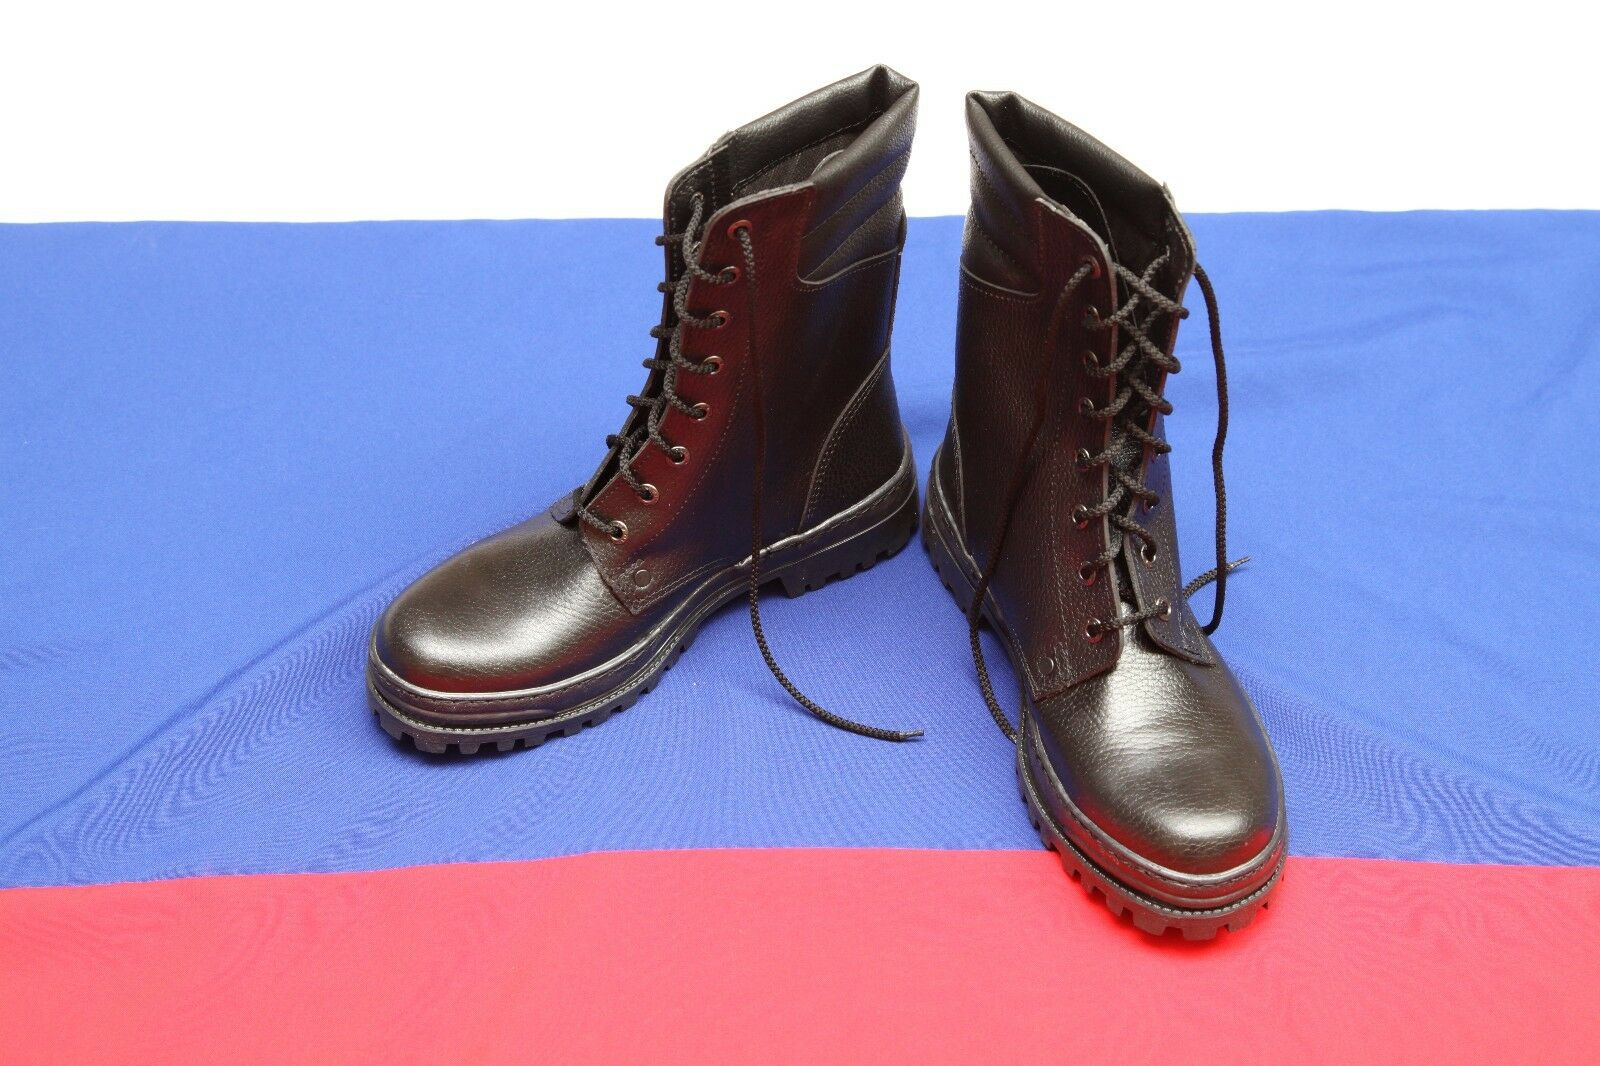 a prezzi accessibili Russian army military issued summer nero leather combat combat combat stivali  negozio online outlet